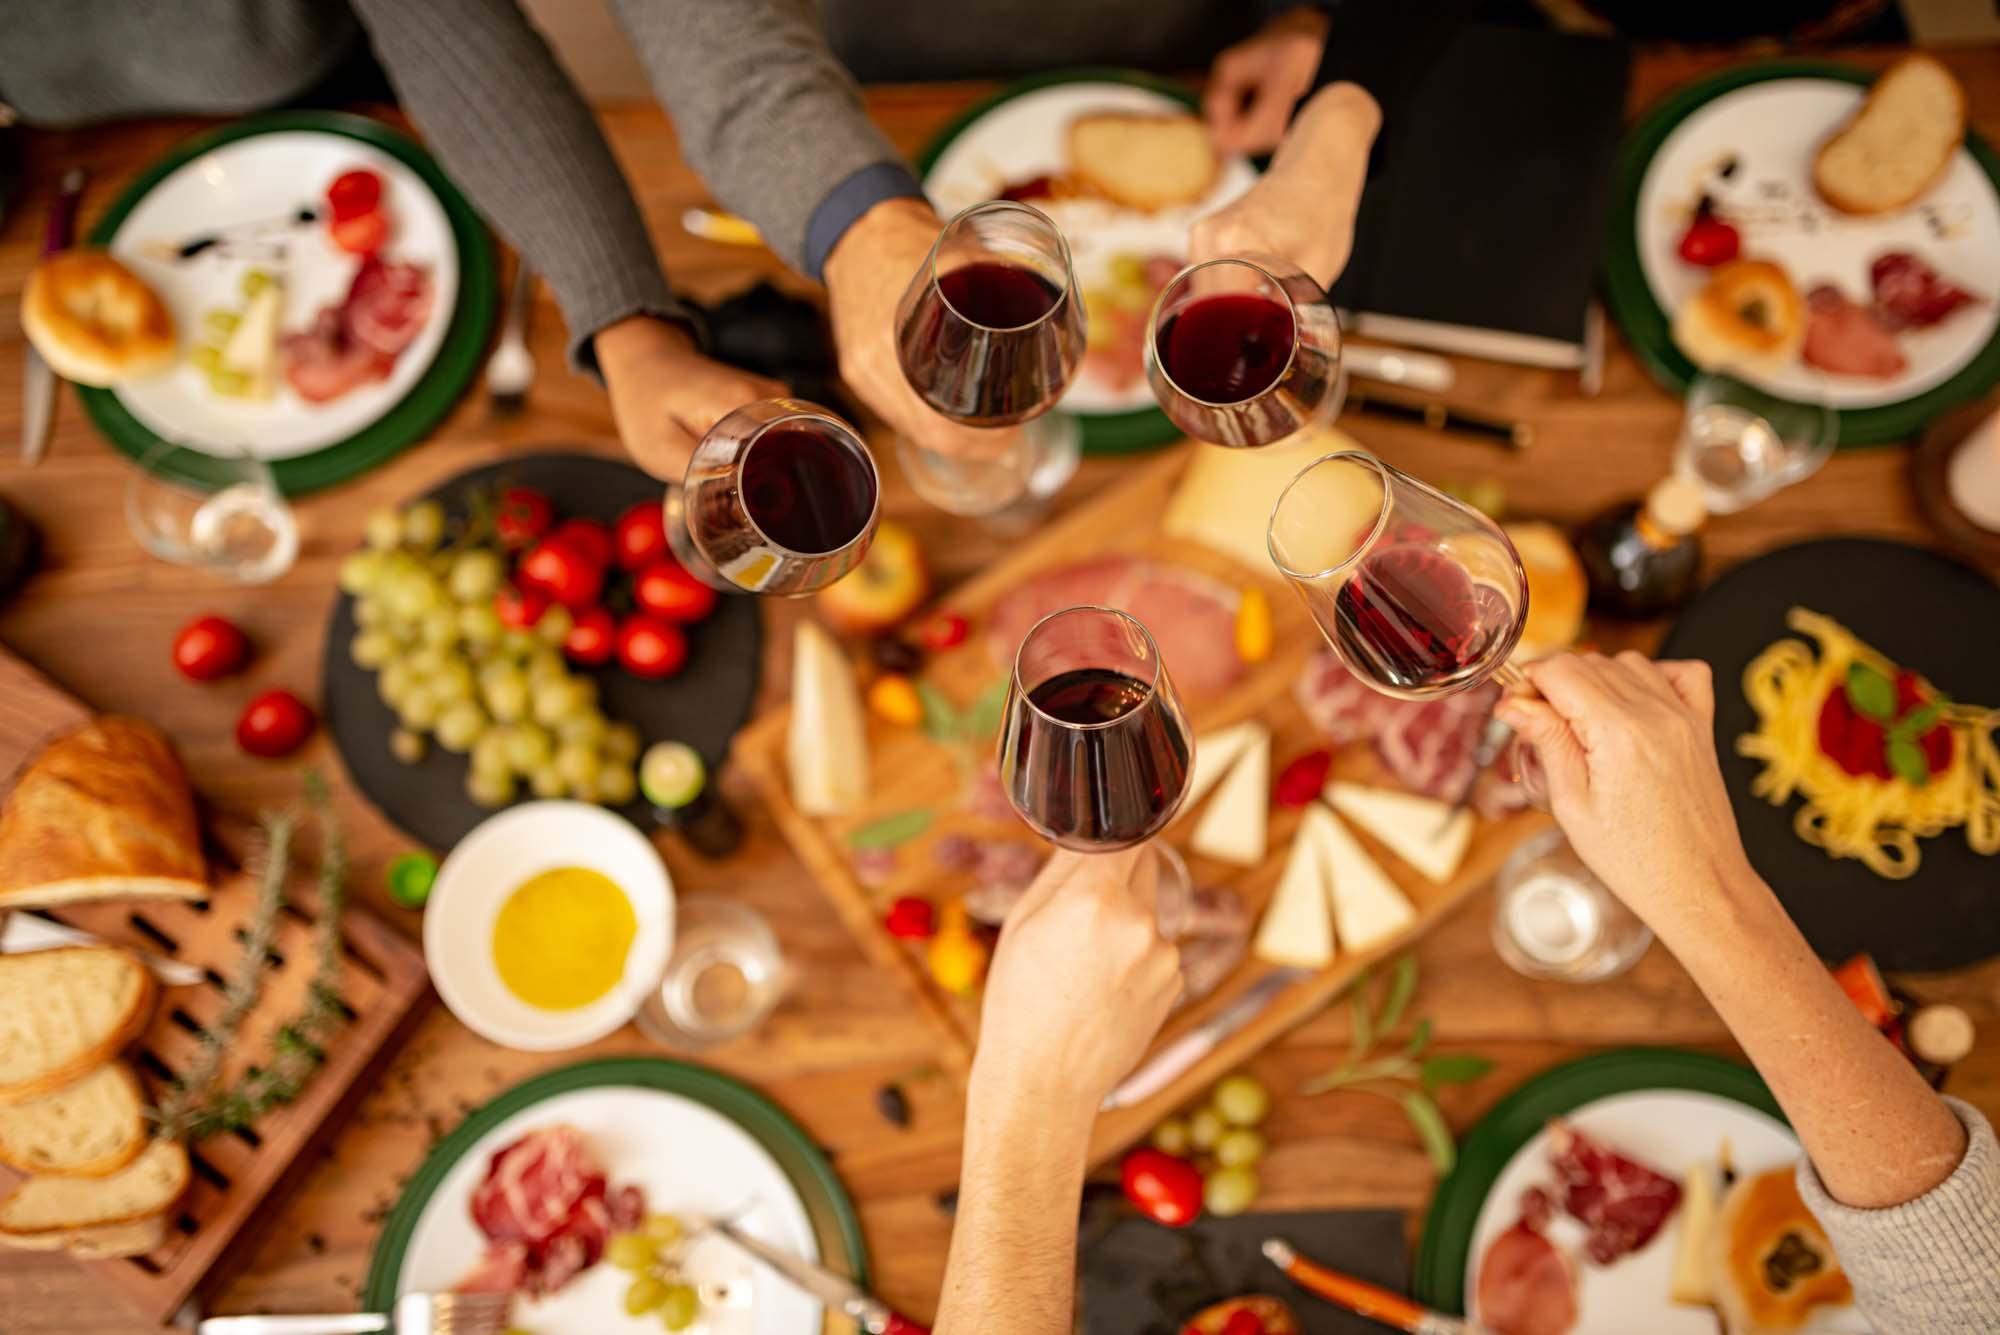 Corsi Di Cucina Eventi Aziendali a Padova